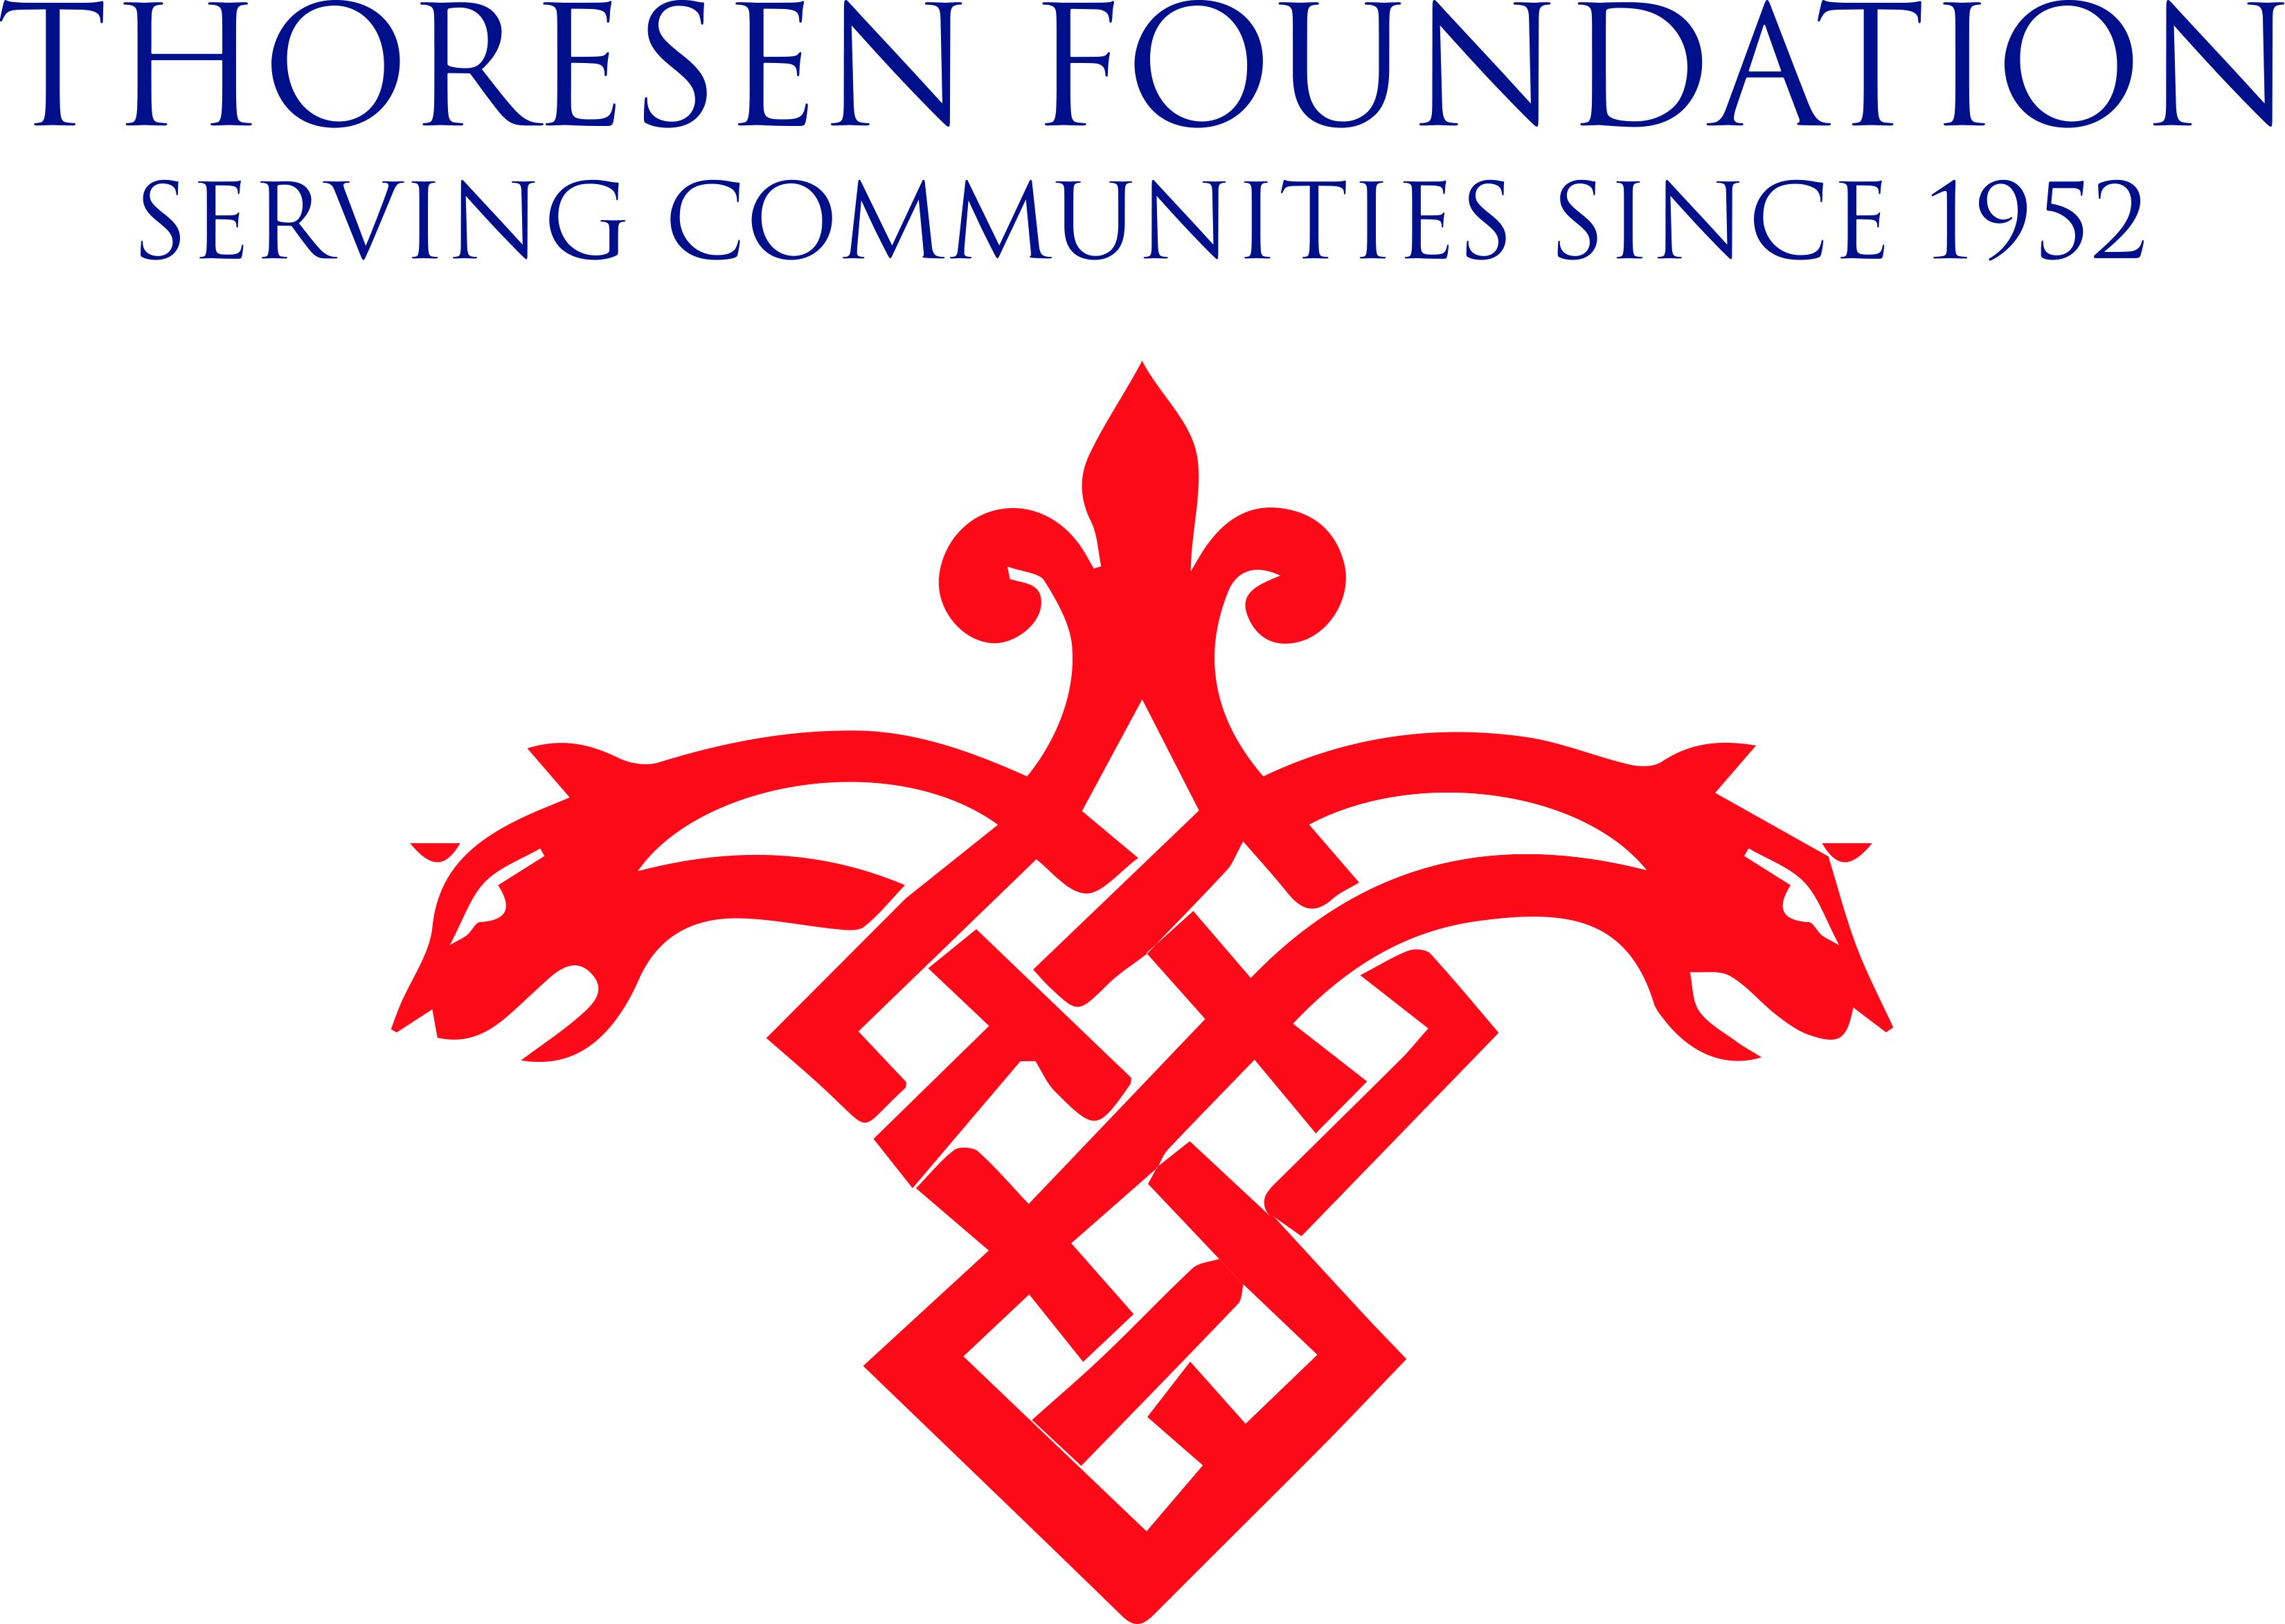 Thoresen Foundation